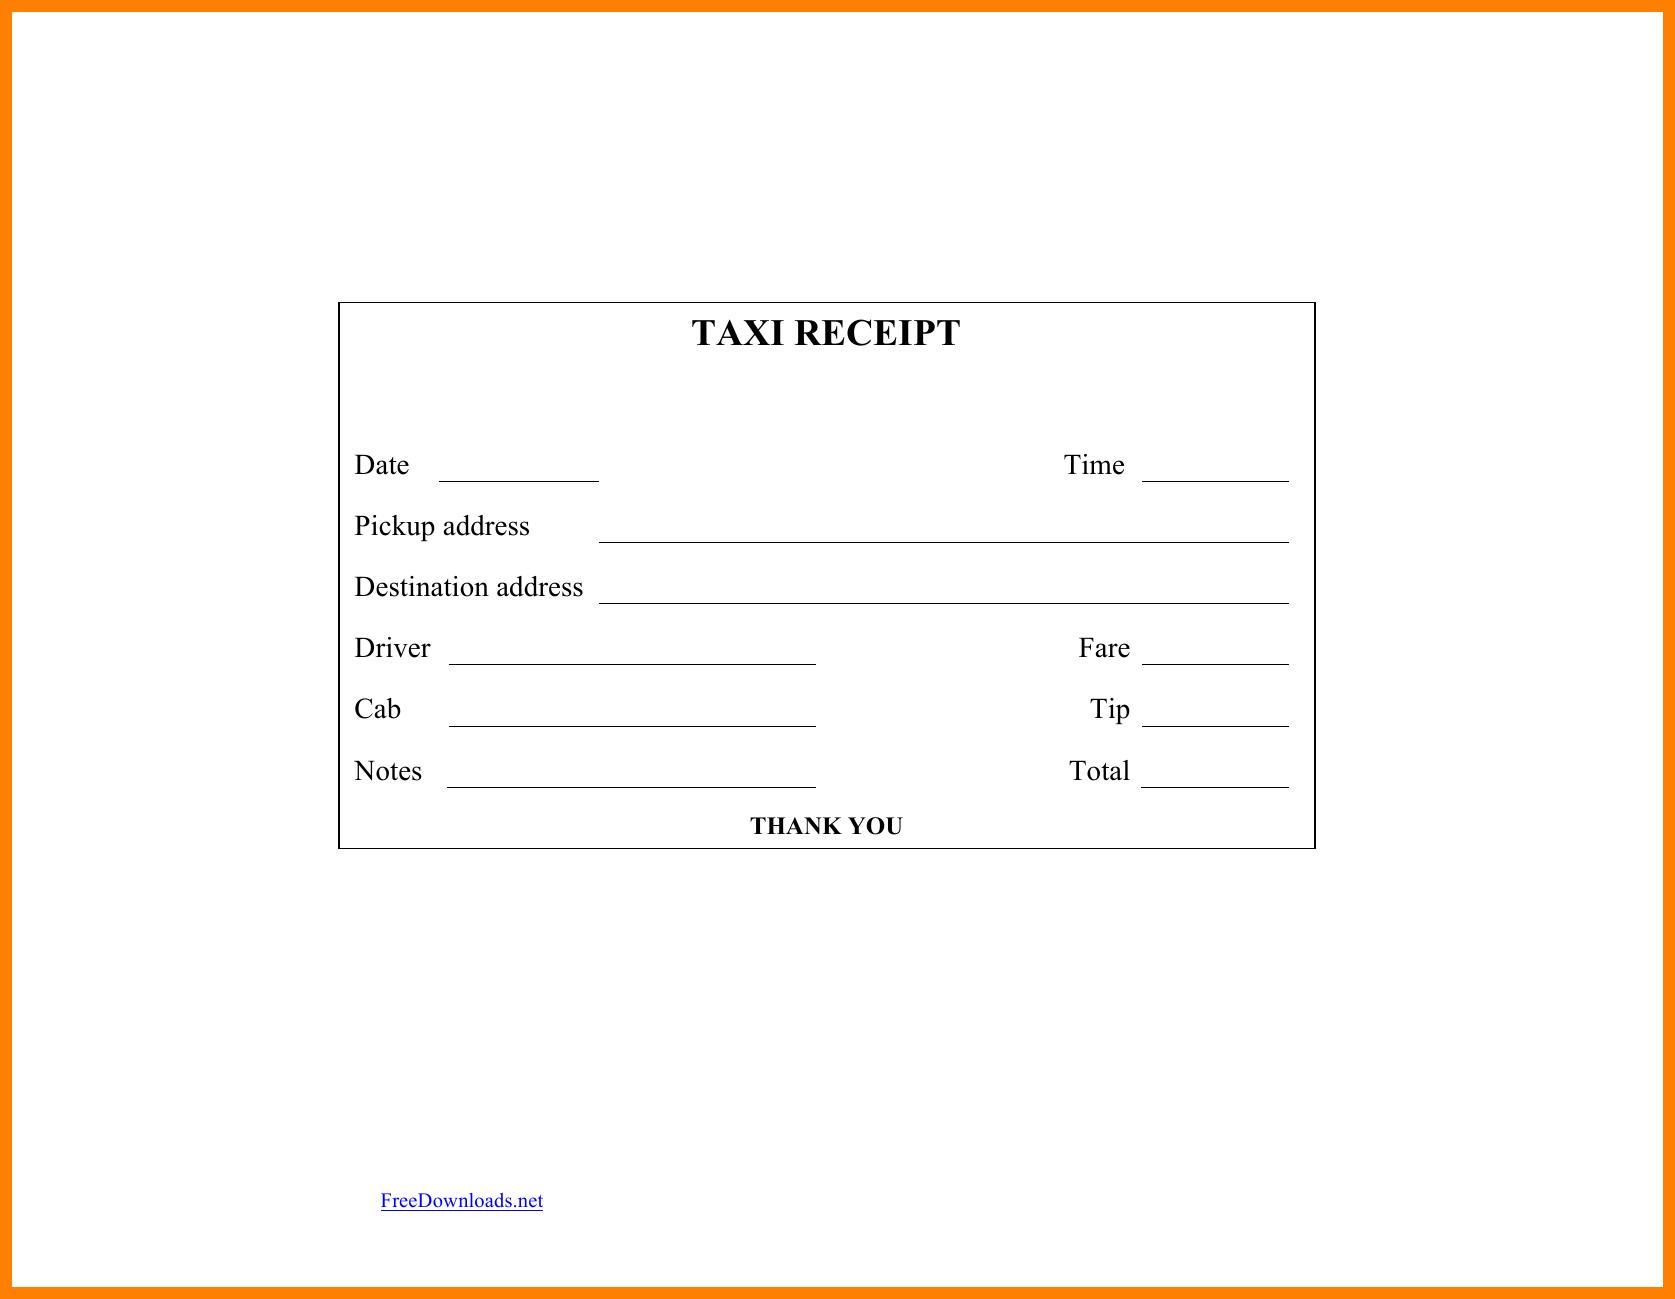 10+ Generic Taxi Receipt | Reptile Shop Birmingham in Blank Taxi Receipt Template